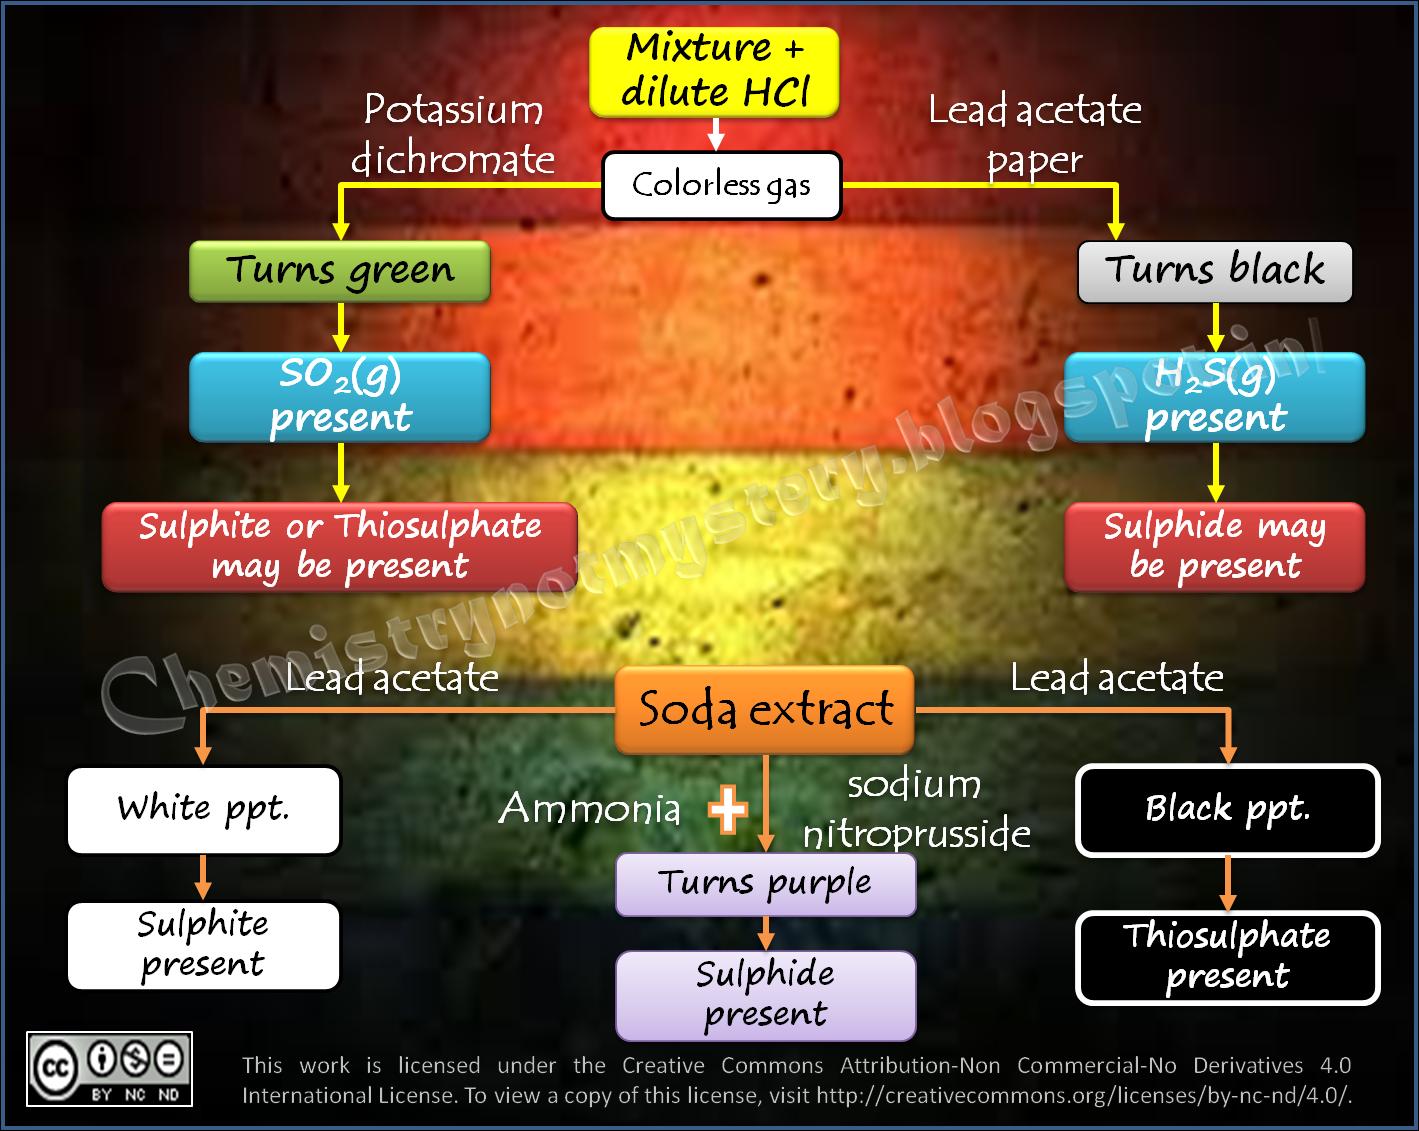 Qualitative analysis of Anions: Sulphite, Thiosulphate, Sulphide